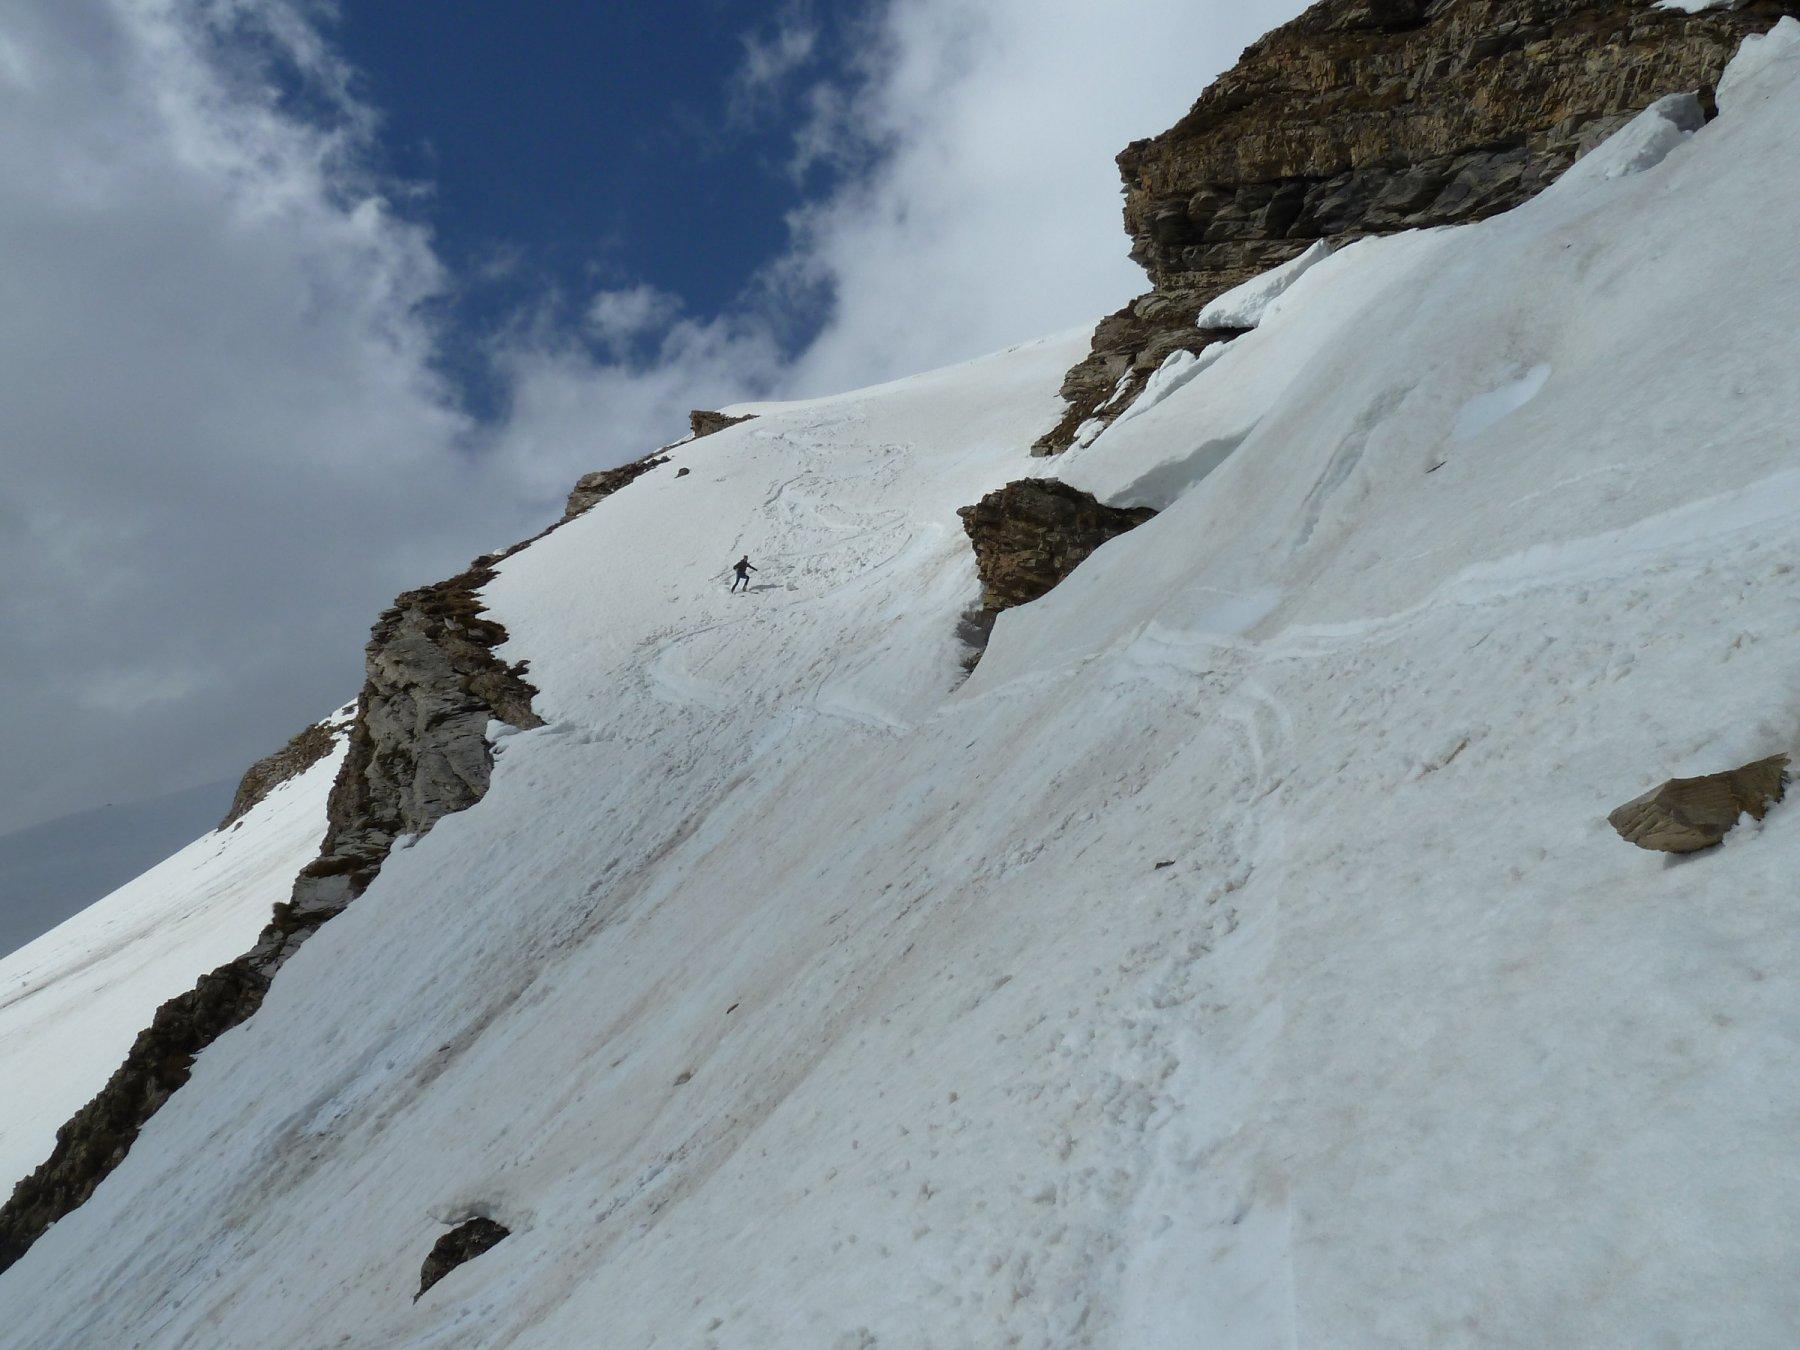 breve tratto ripido su neve umida